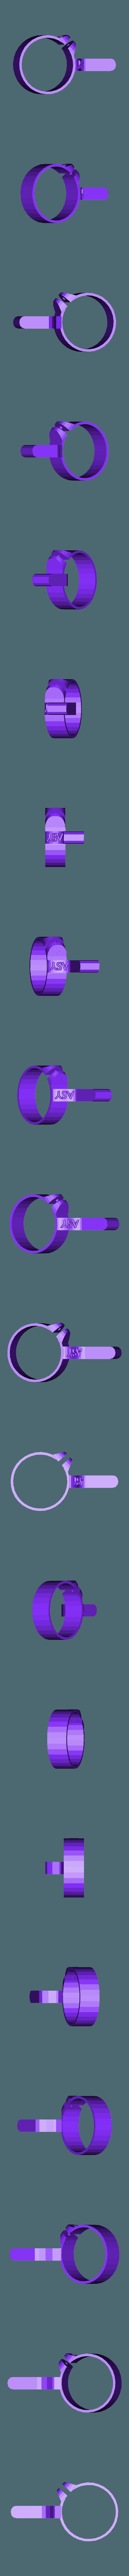 gt3c stering.stl Download free STL file fsgt-3c /3d stering adapter • 3D printer design, suryacan24